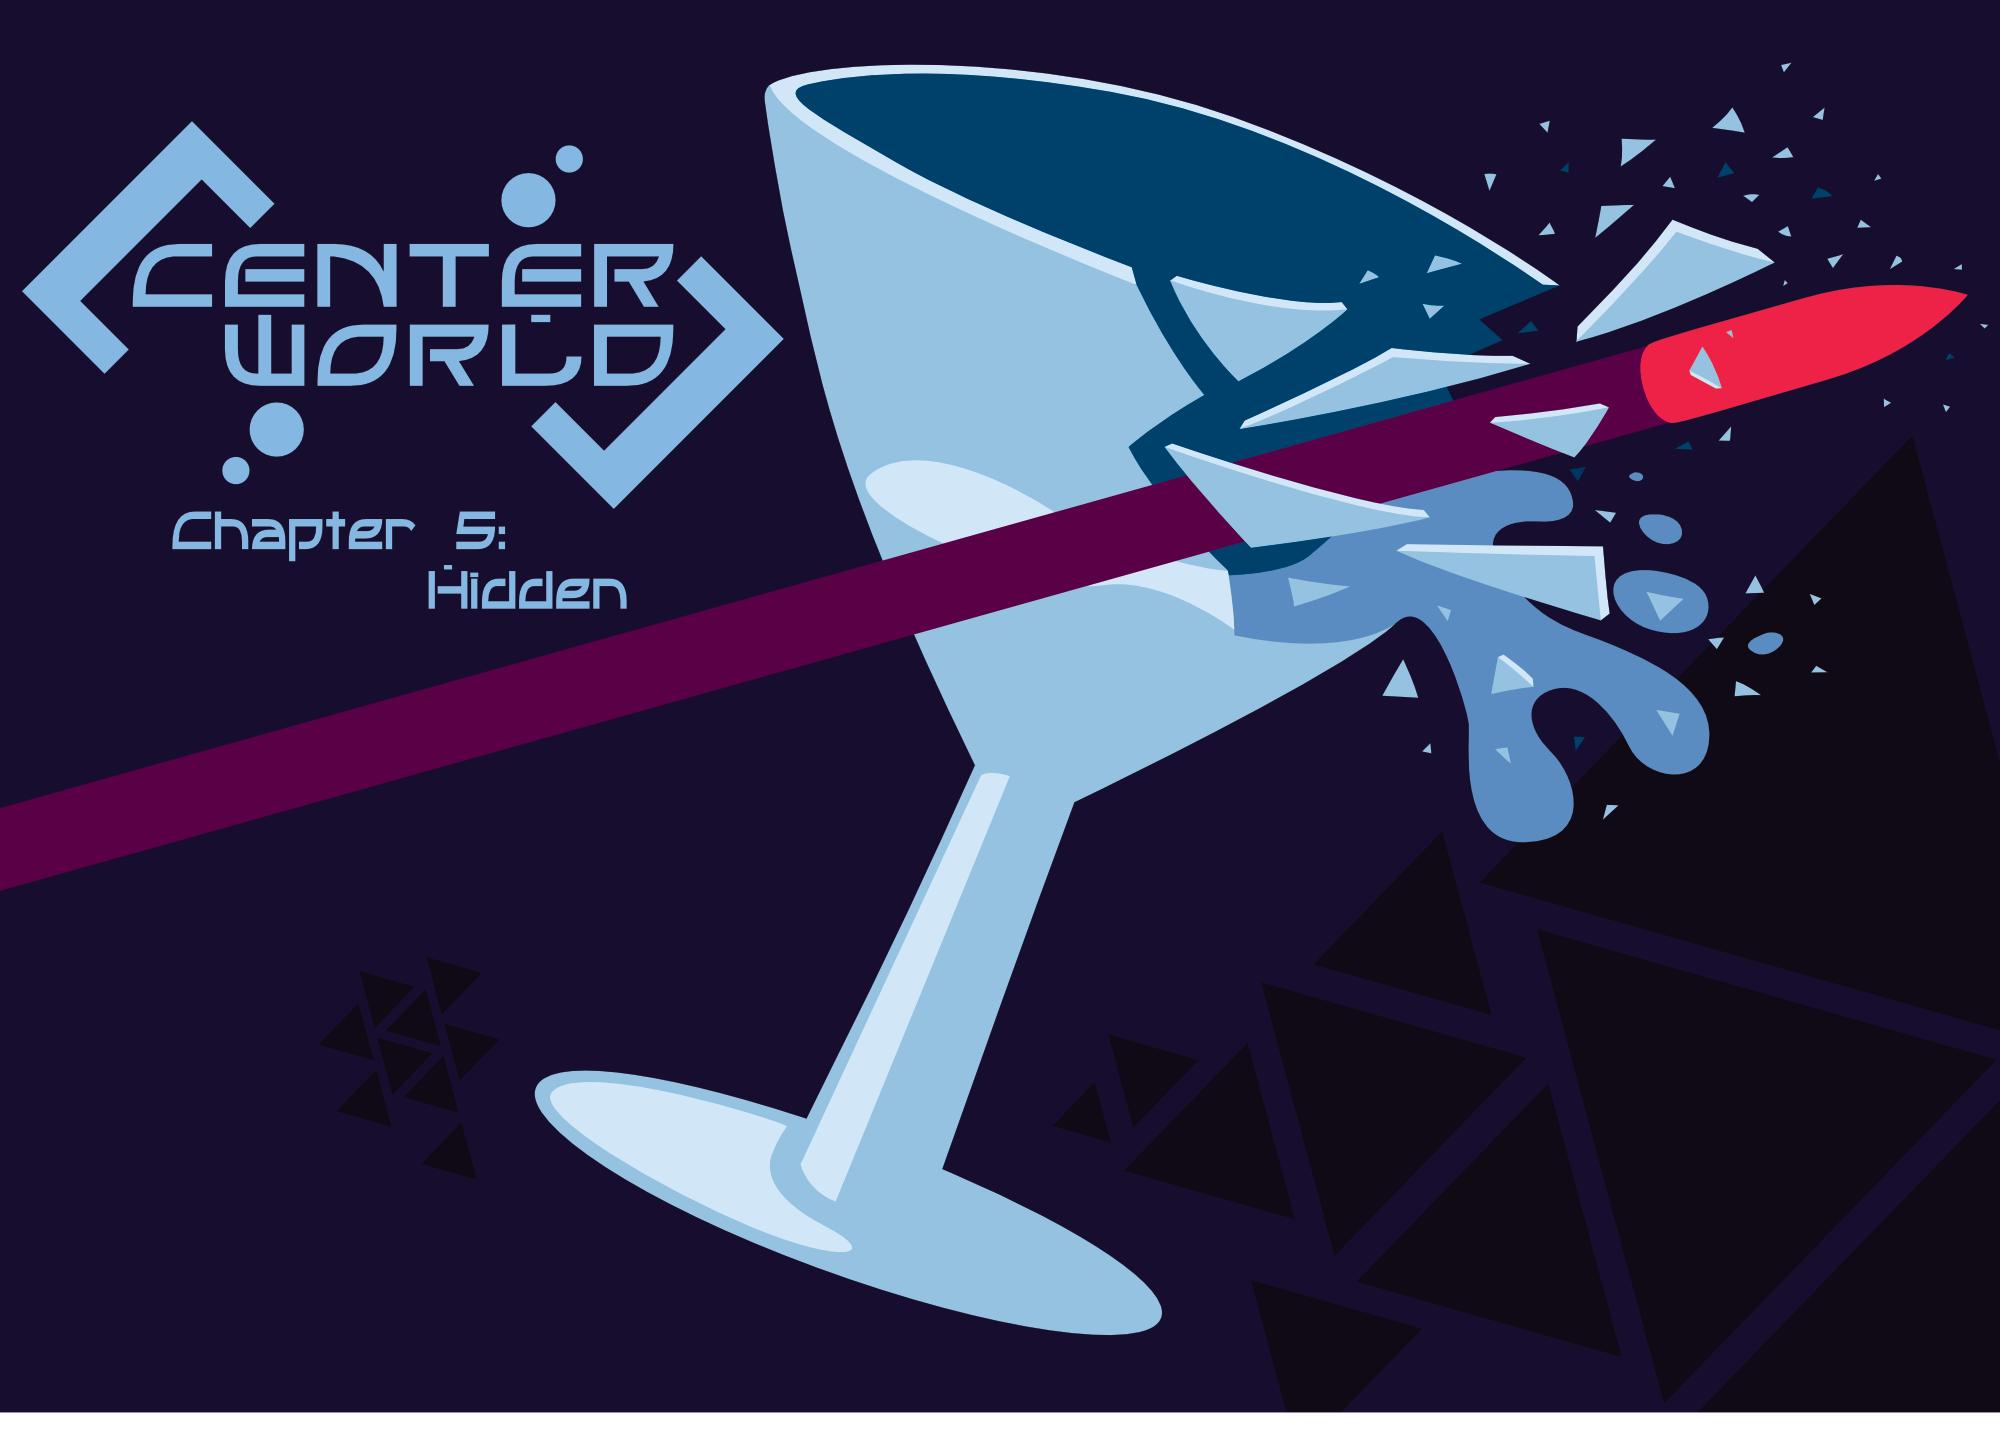 Center World 5.0